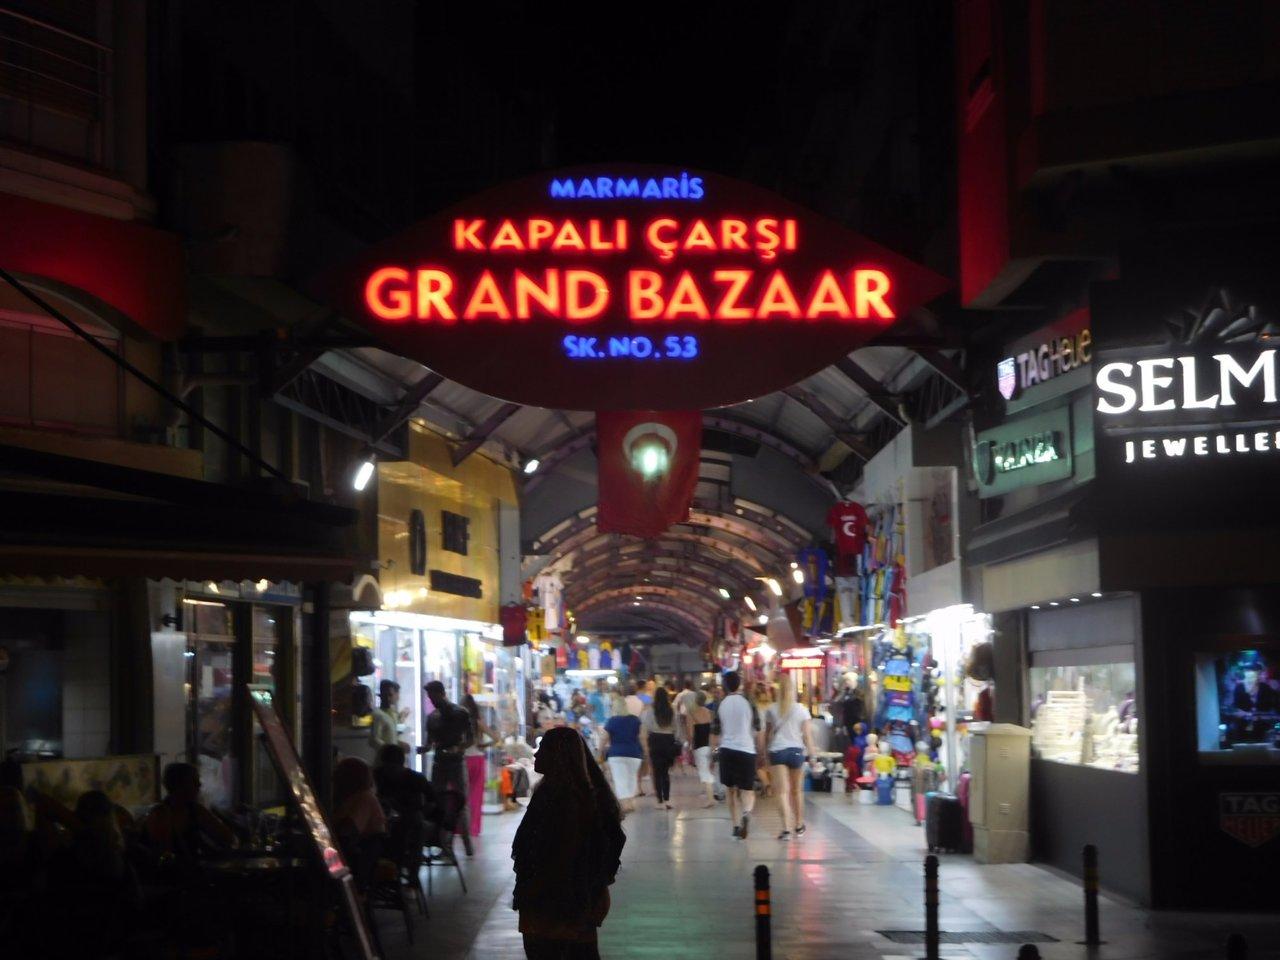 Большой базар или Гранд базар